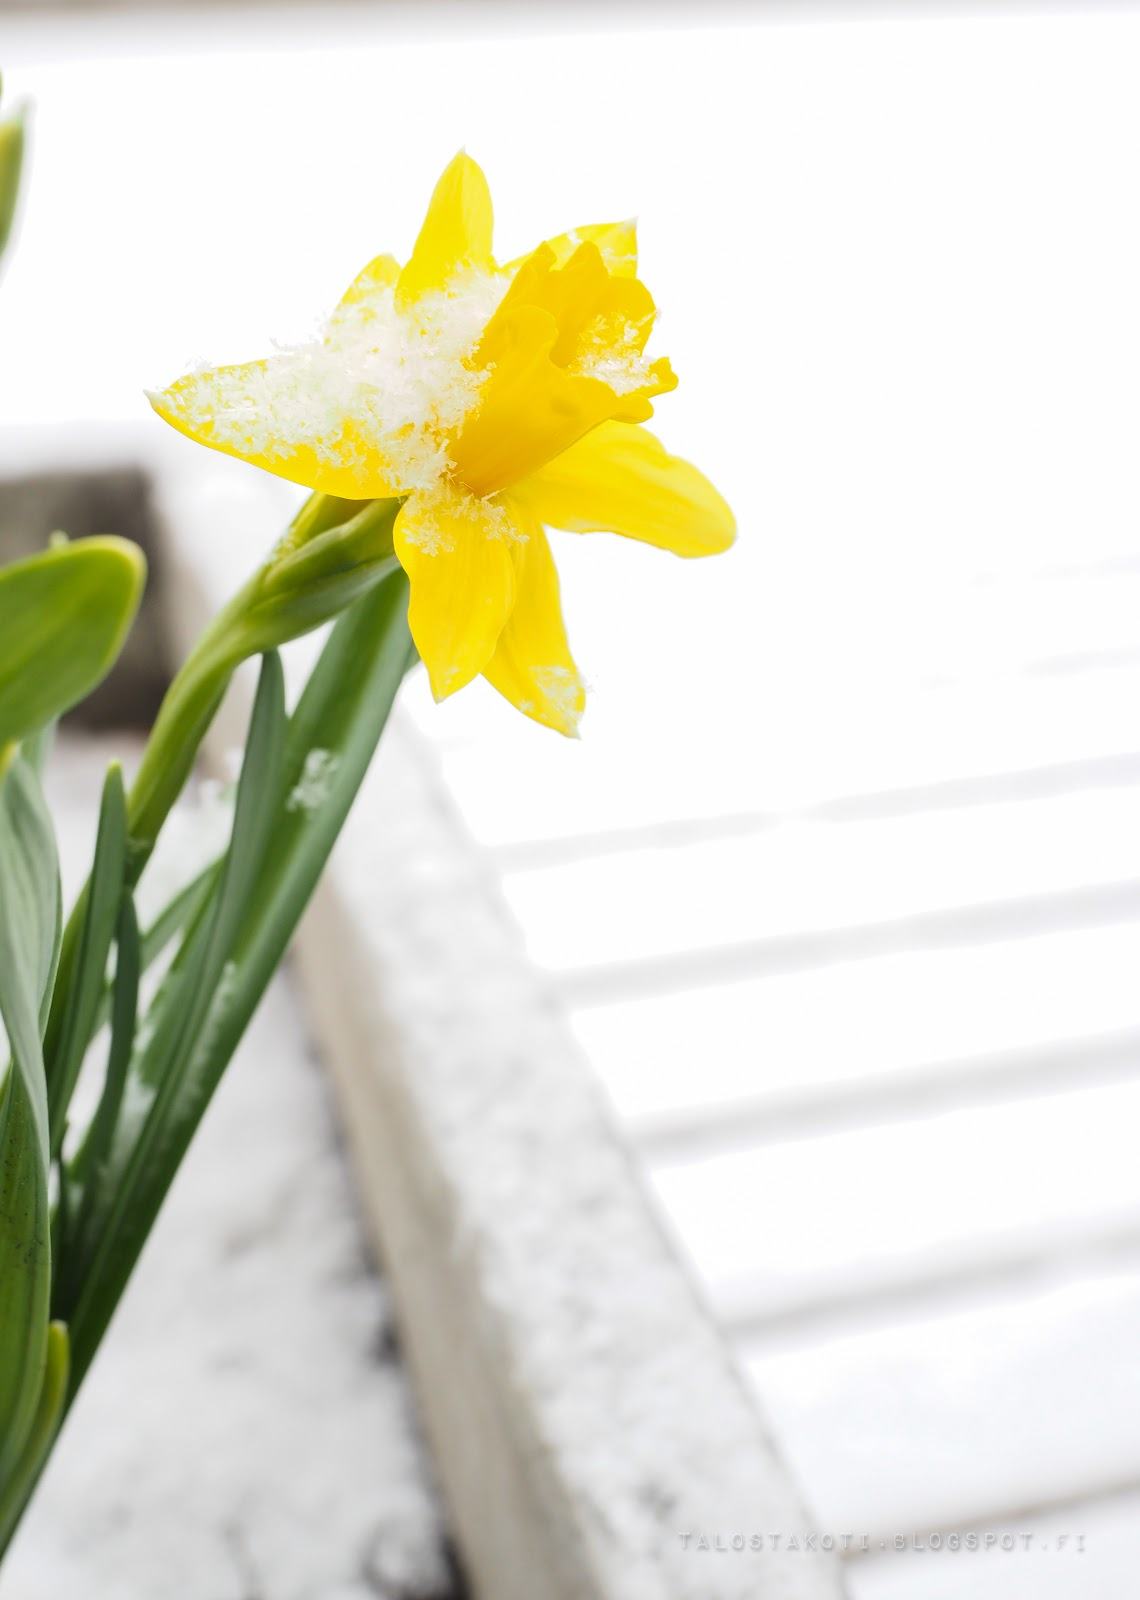 kevätmessut, kevät, narsissi, terassi